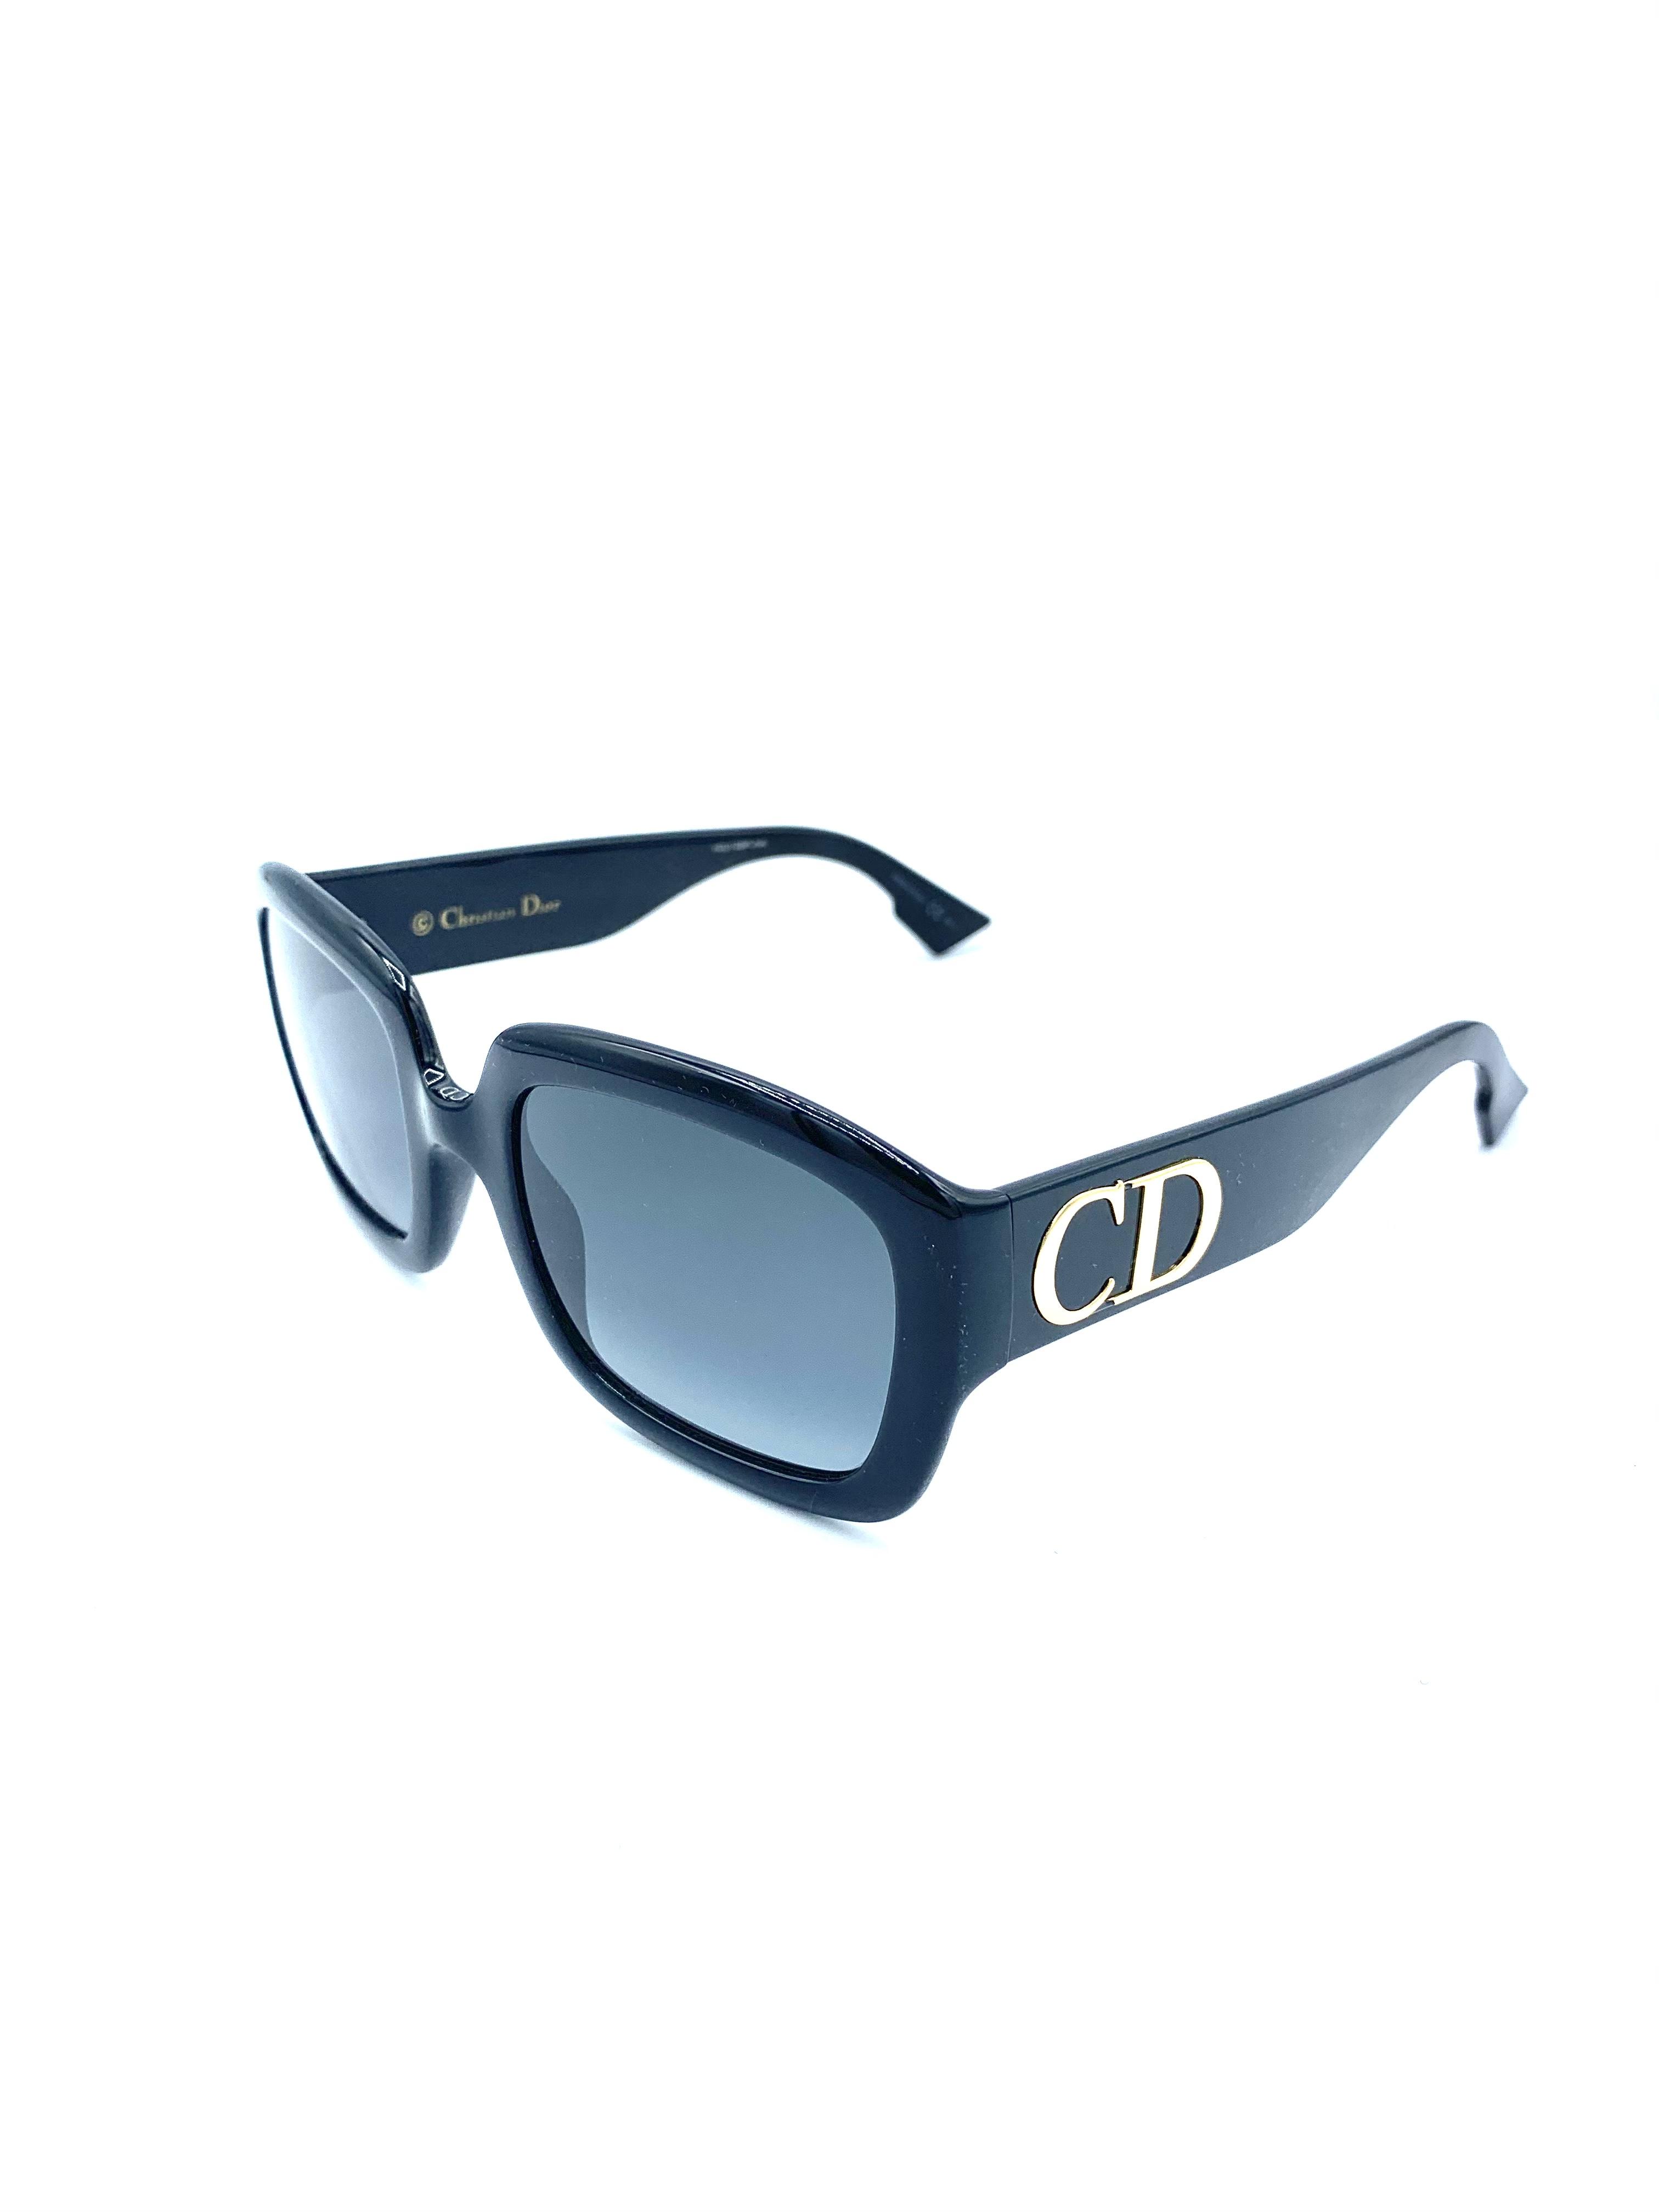 Christian Dior - Ottica Bergamo eShop